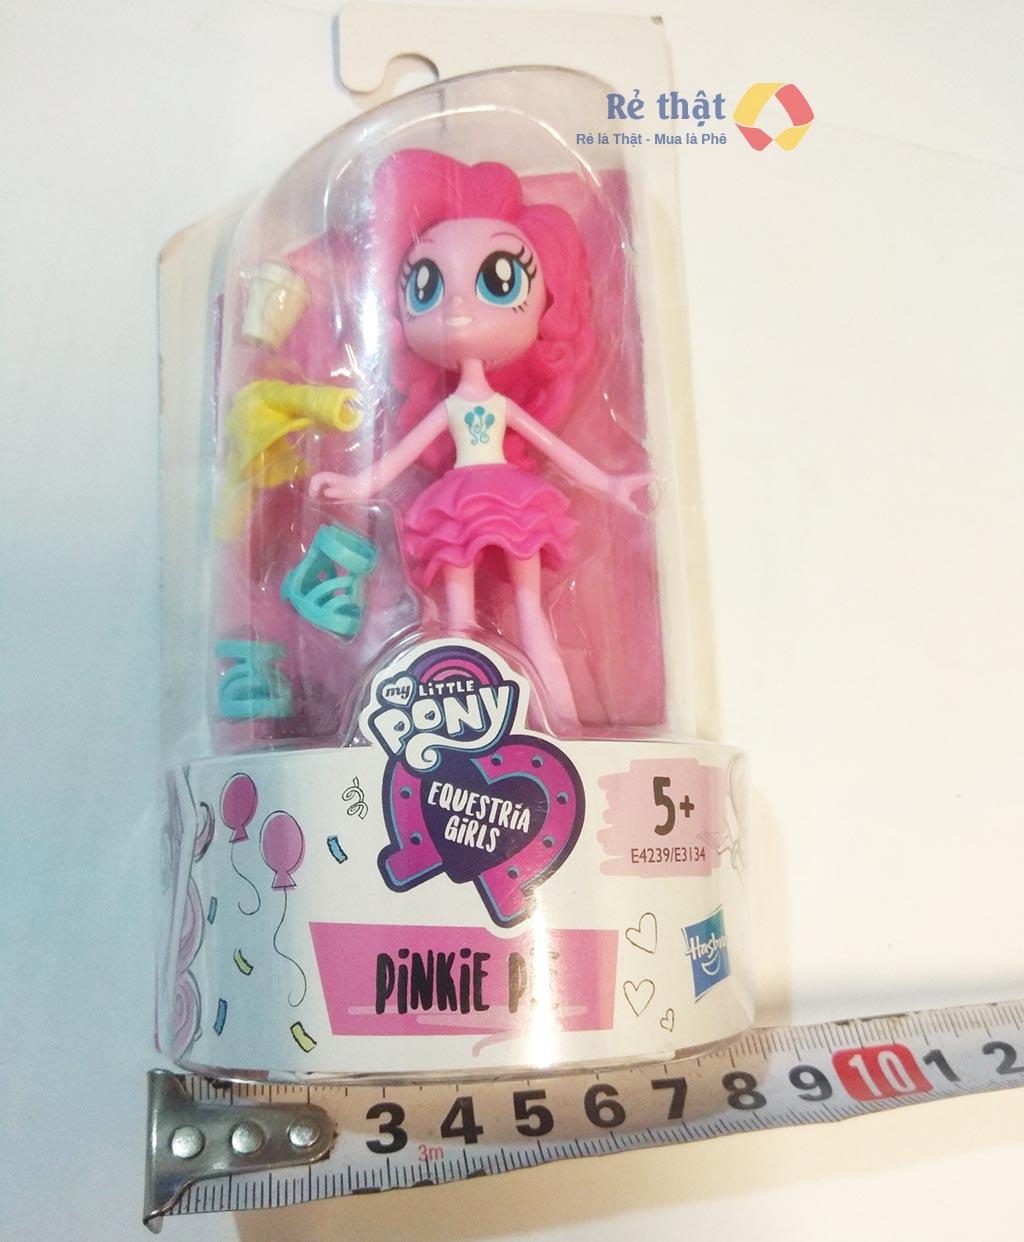 Búp bê My Little Pony Minis Modne cô gái Equestria Pinkie Pie (Box)